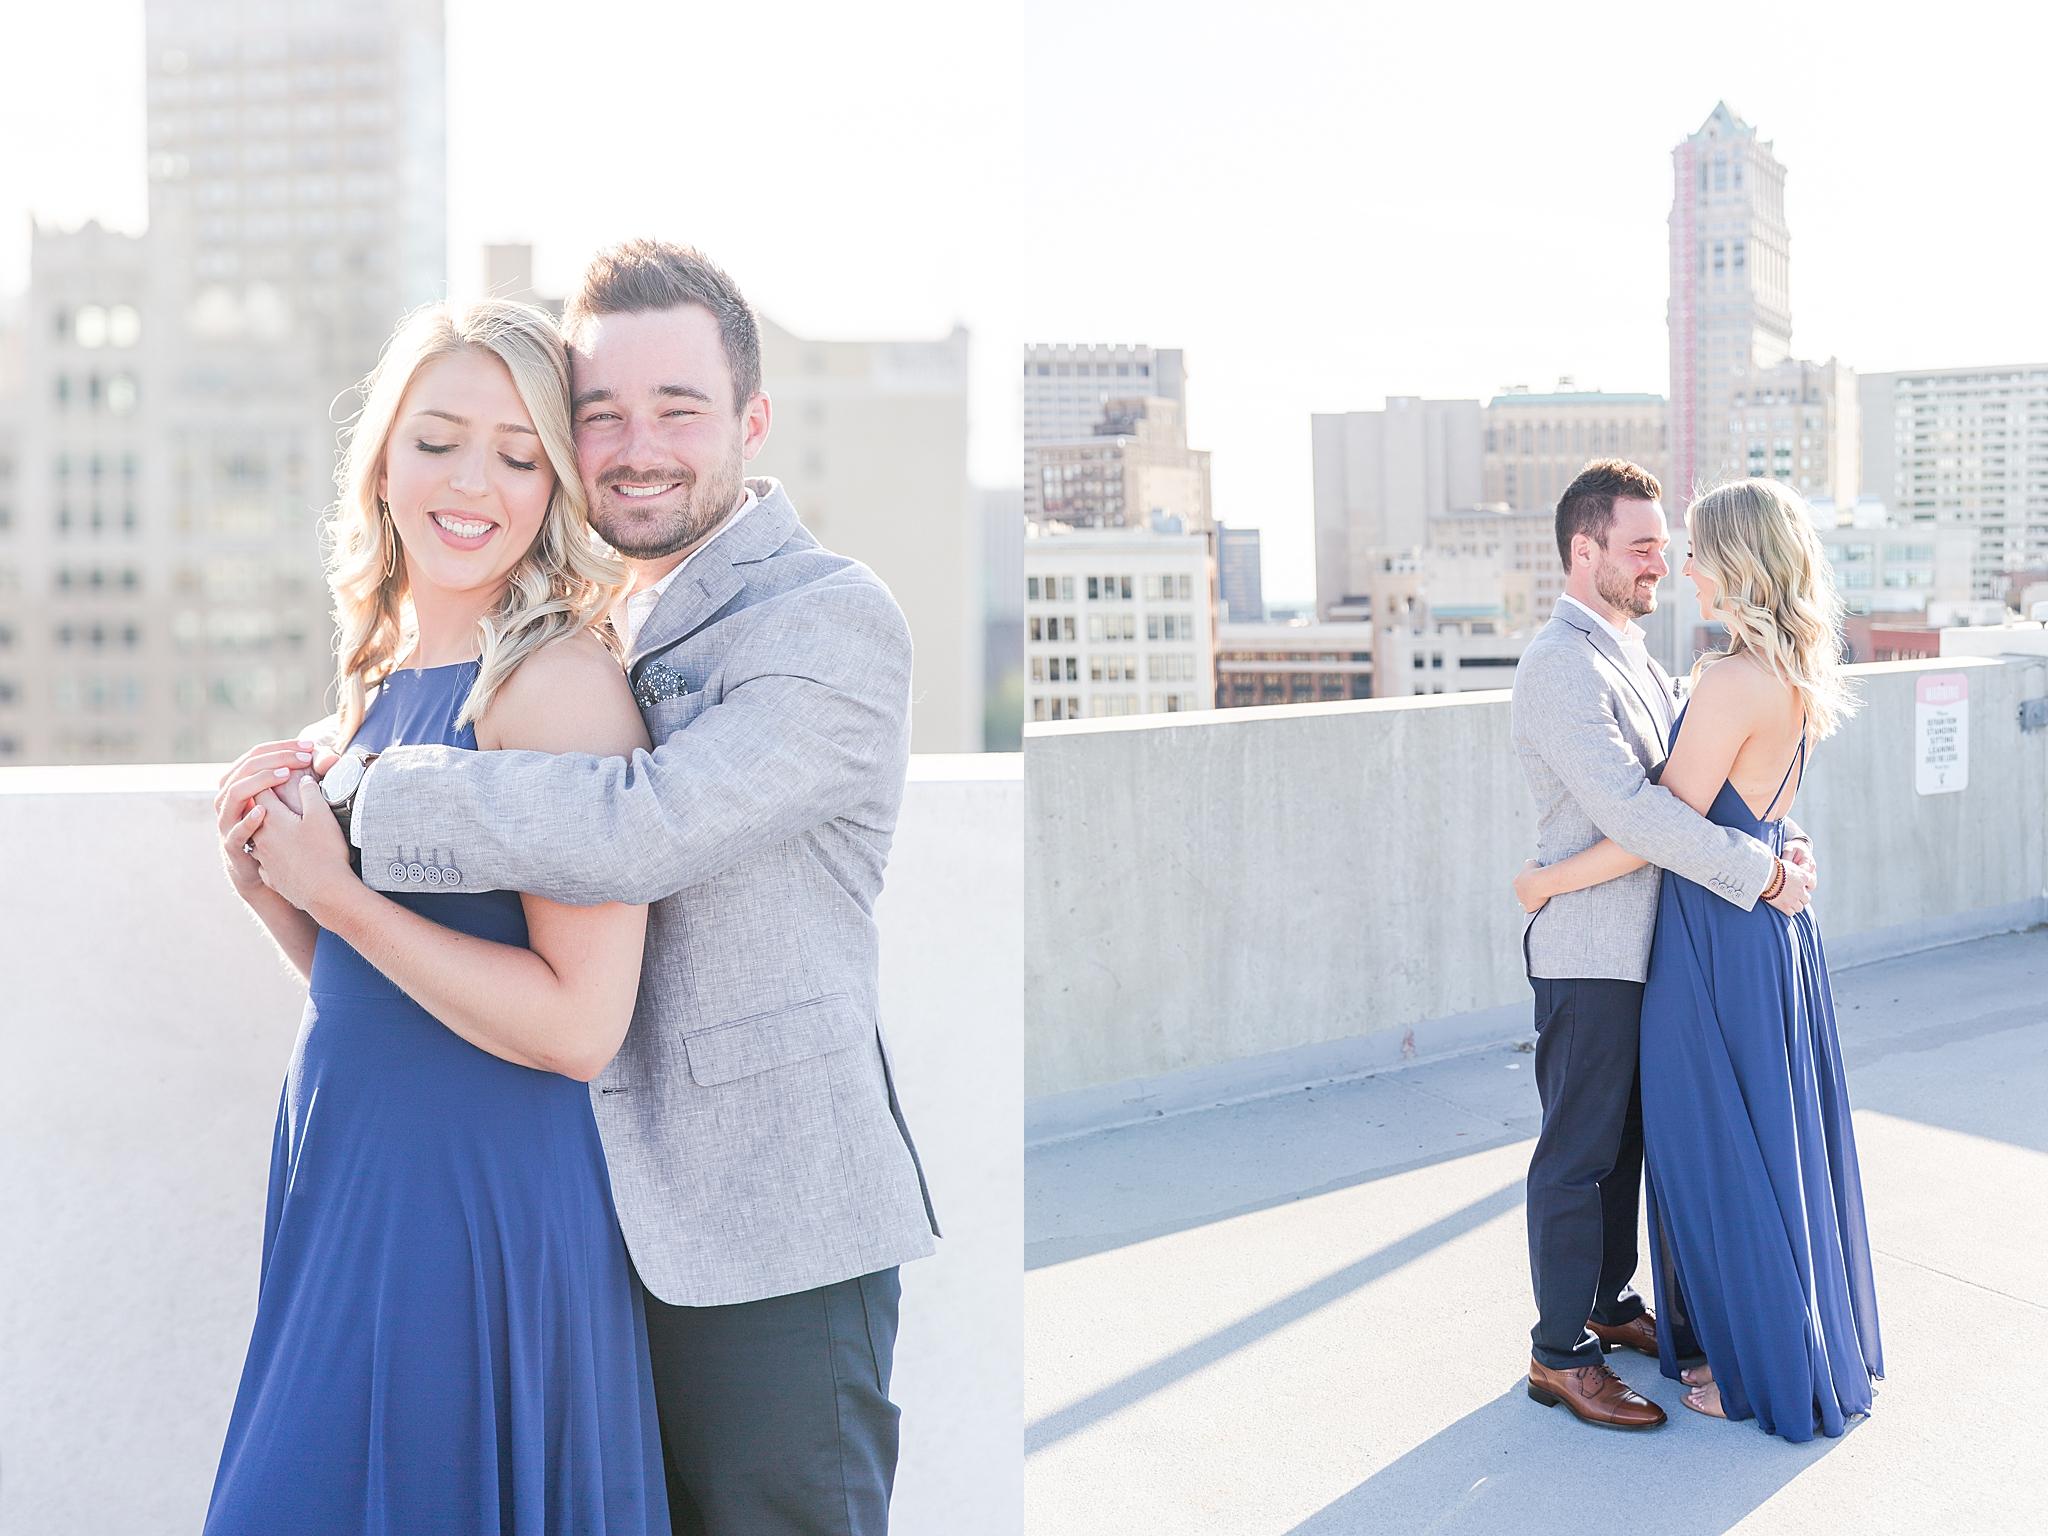 detroit-wedding-photographer-downtown-detroit-belle-isle-engagement-photos-sarah-eric-by-courtney-carolyn-photography_0012.jpg